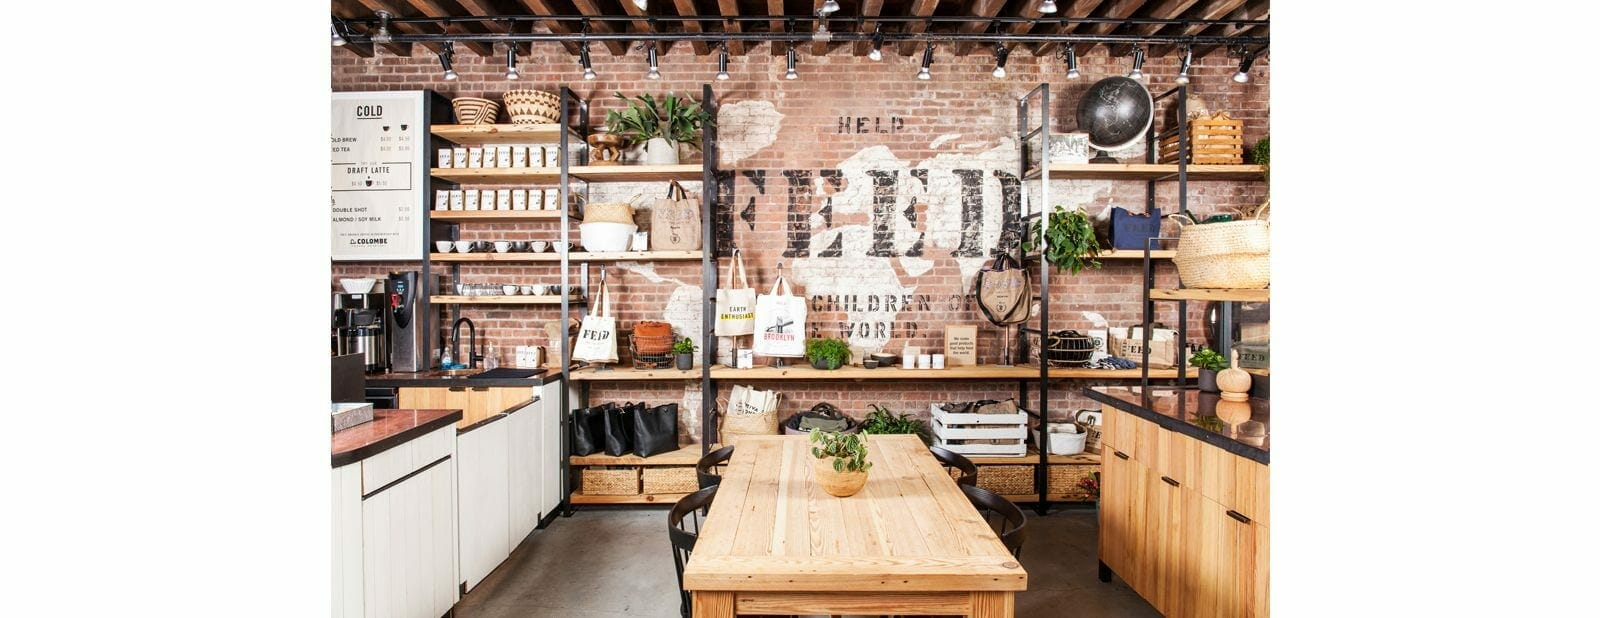 feed empire stores brooklyn